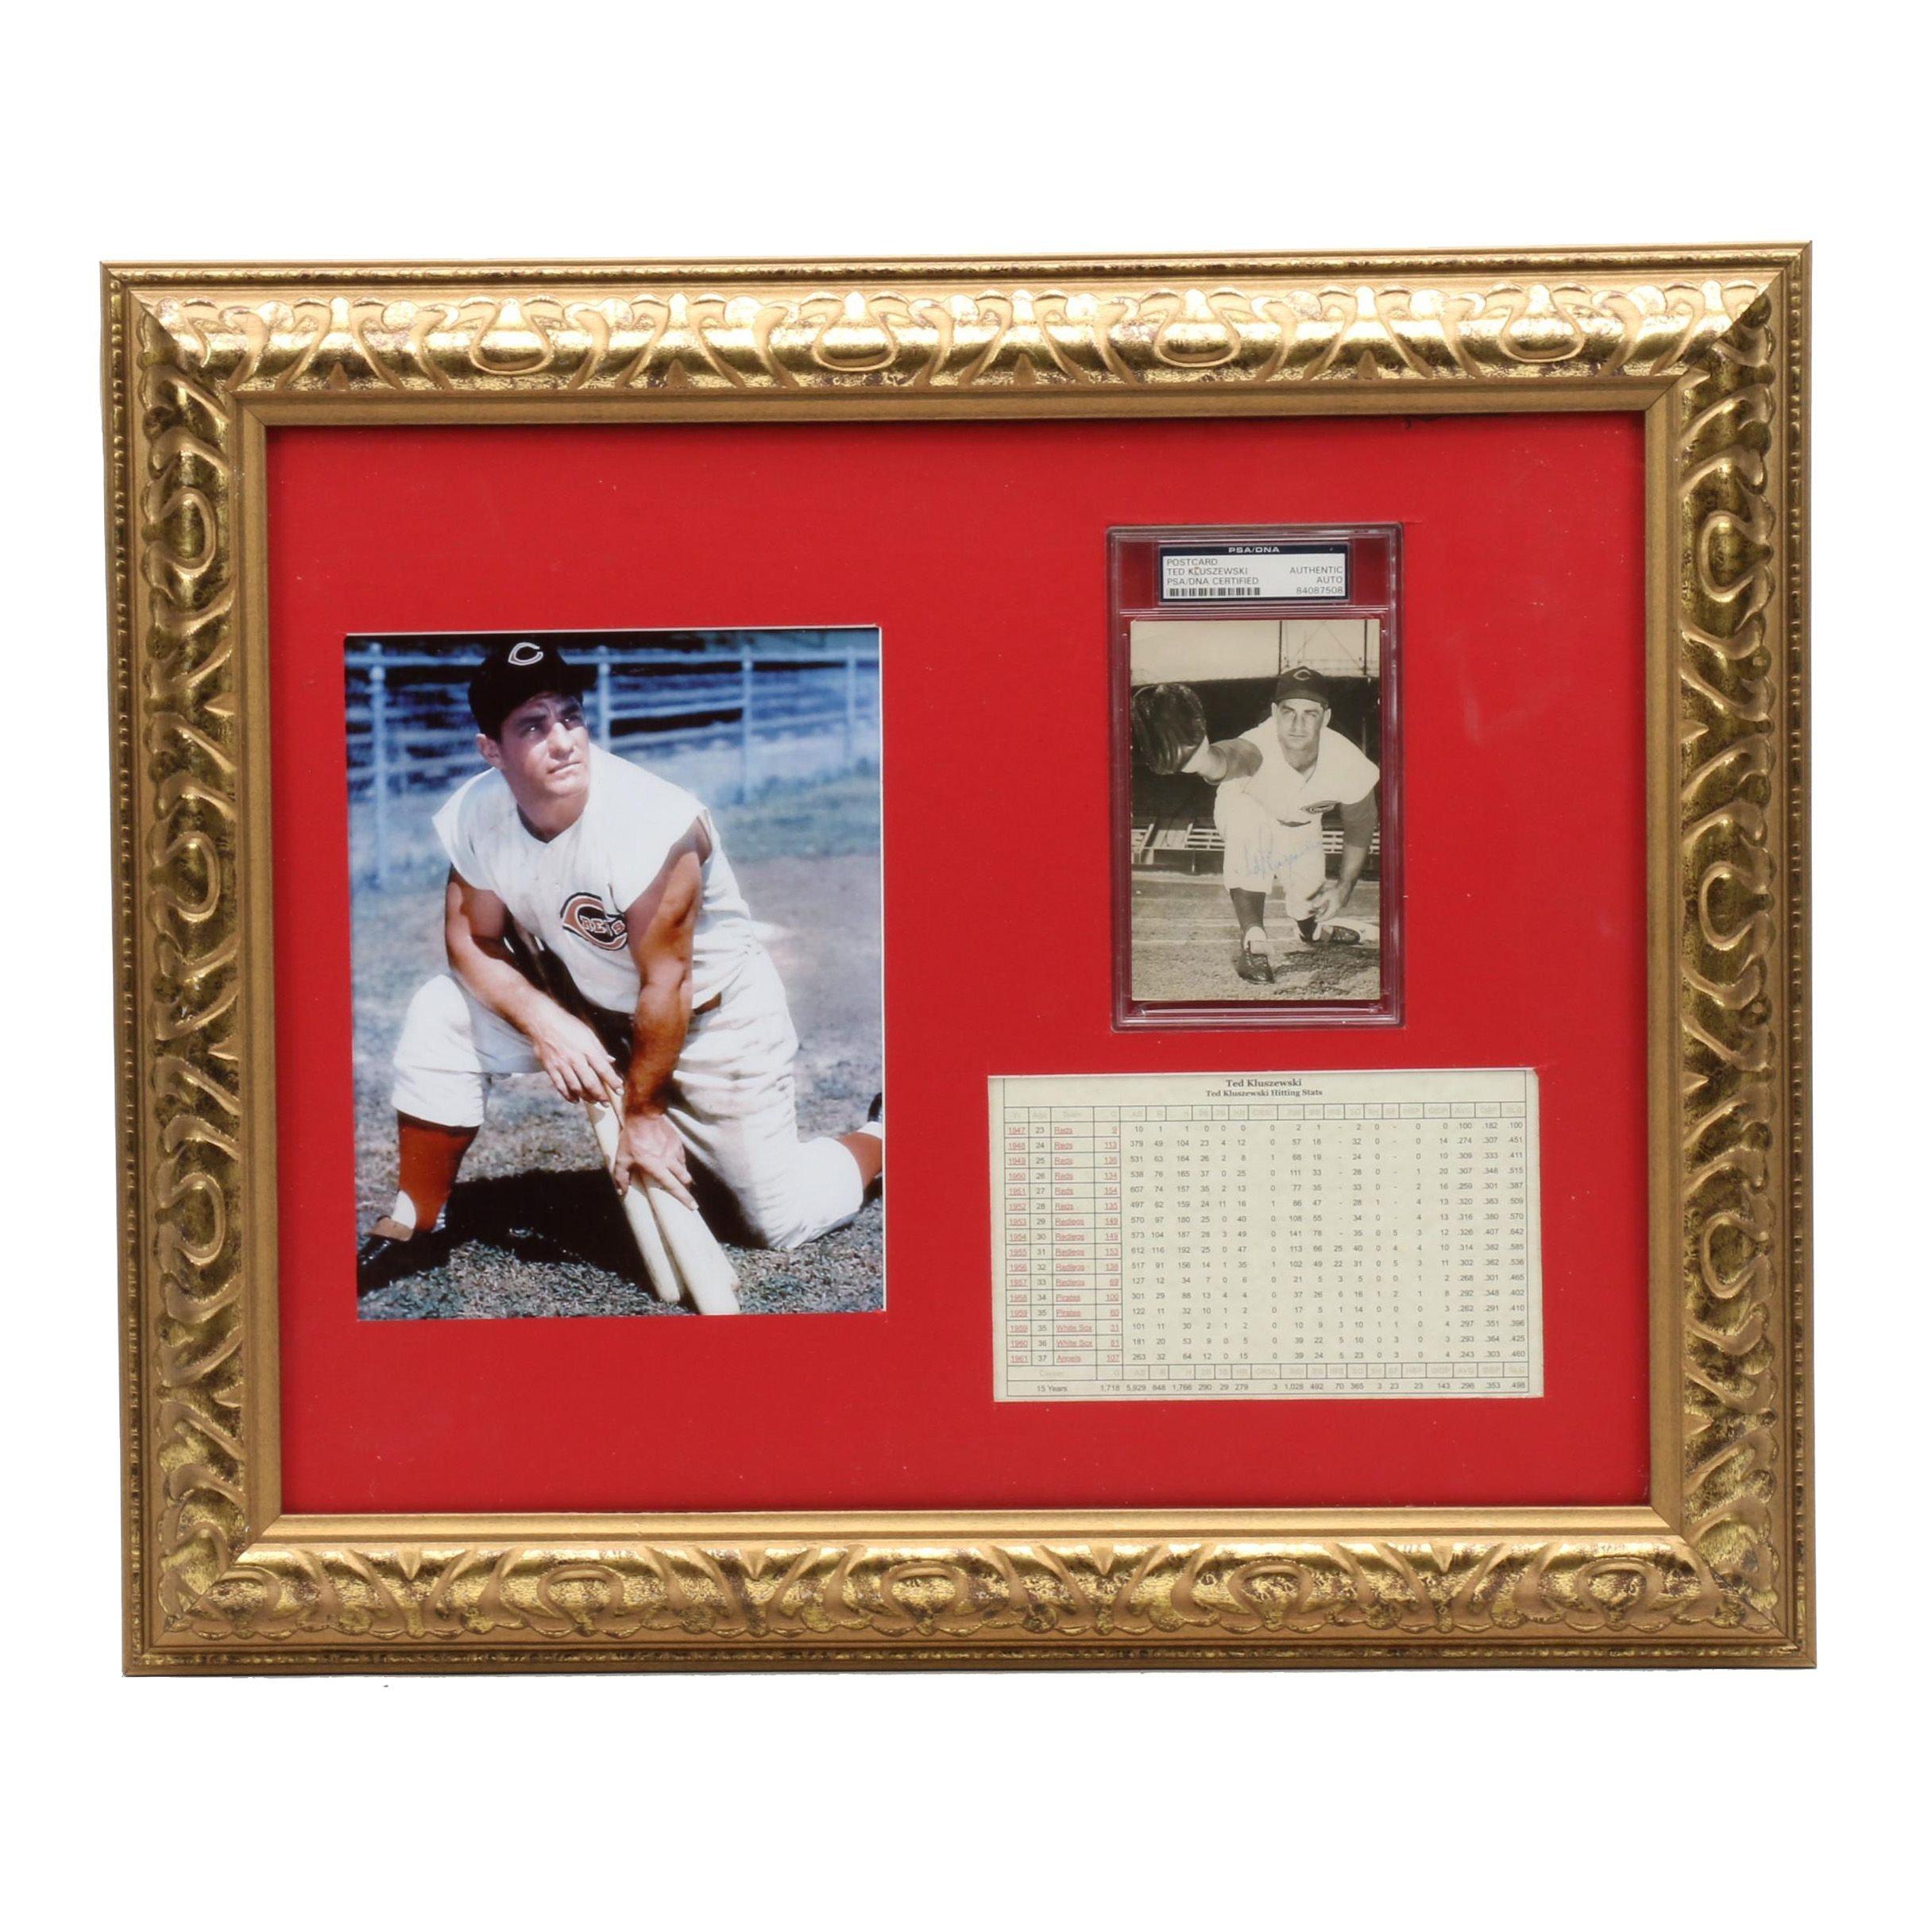 Framed Ted Kluszewski Signed Display  COA